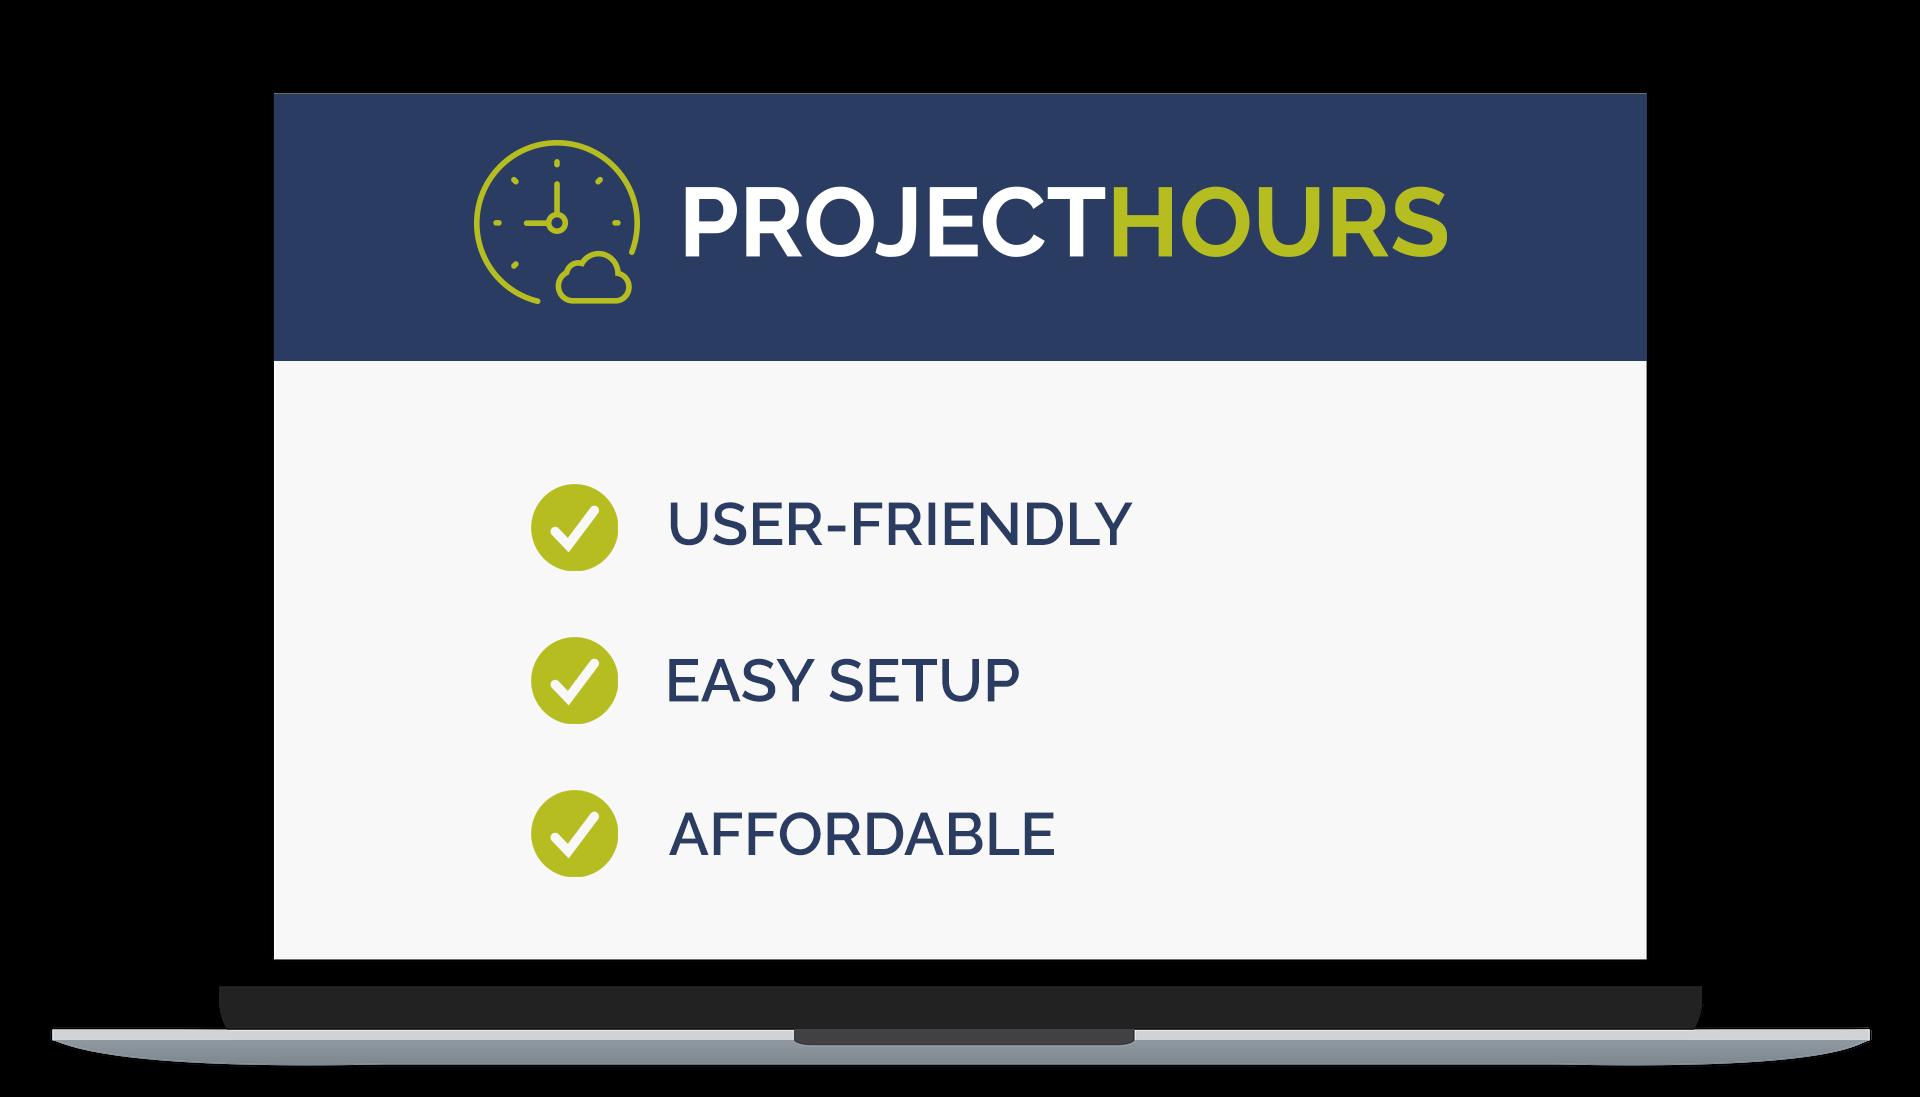 usp-projecthours-timetracking-app